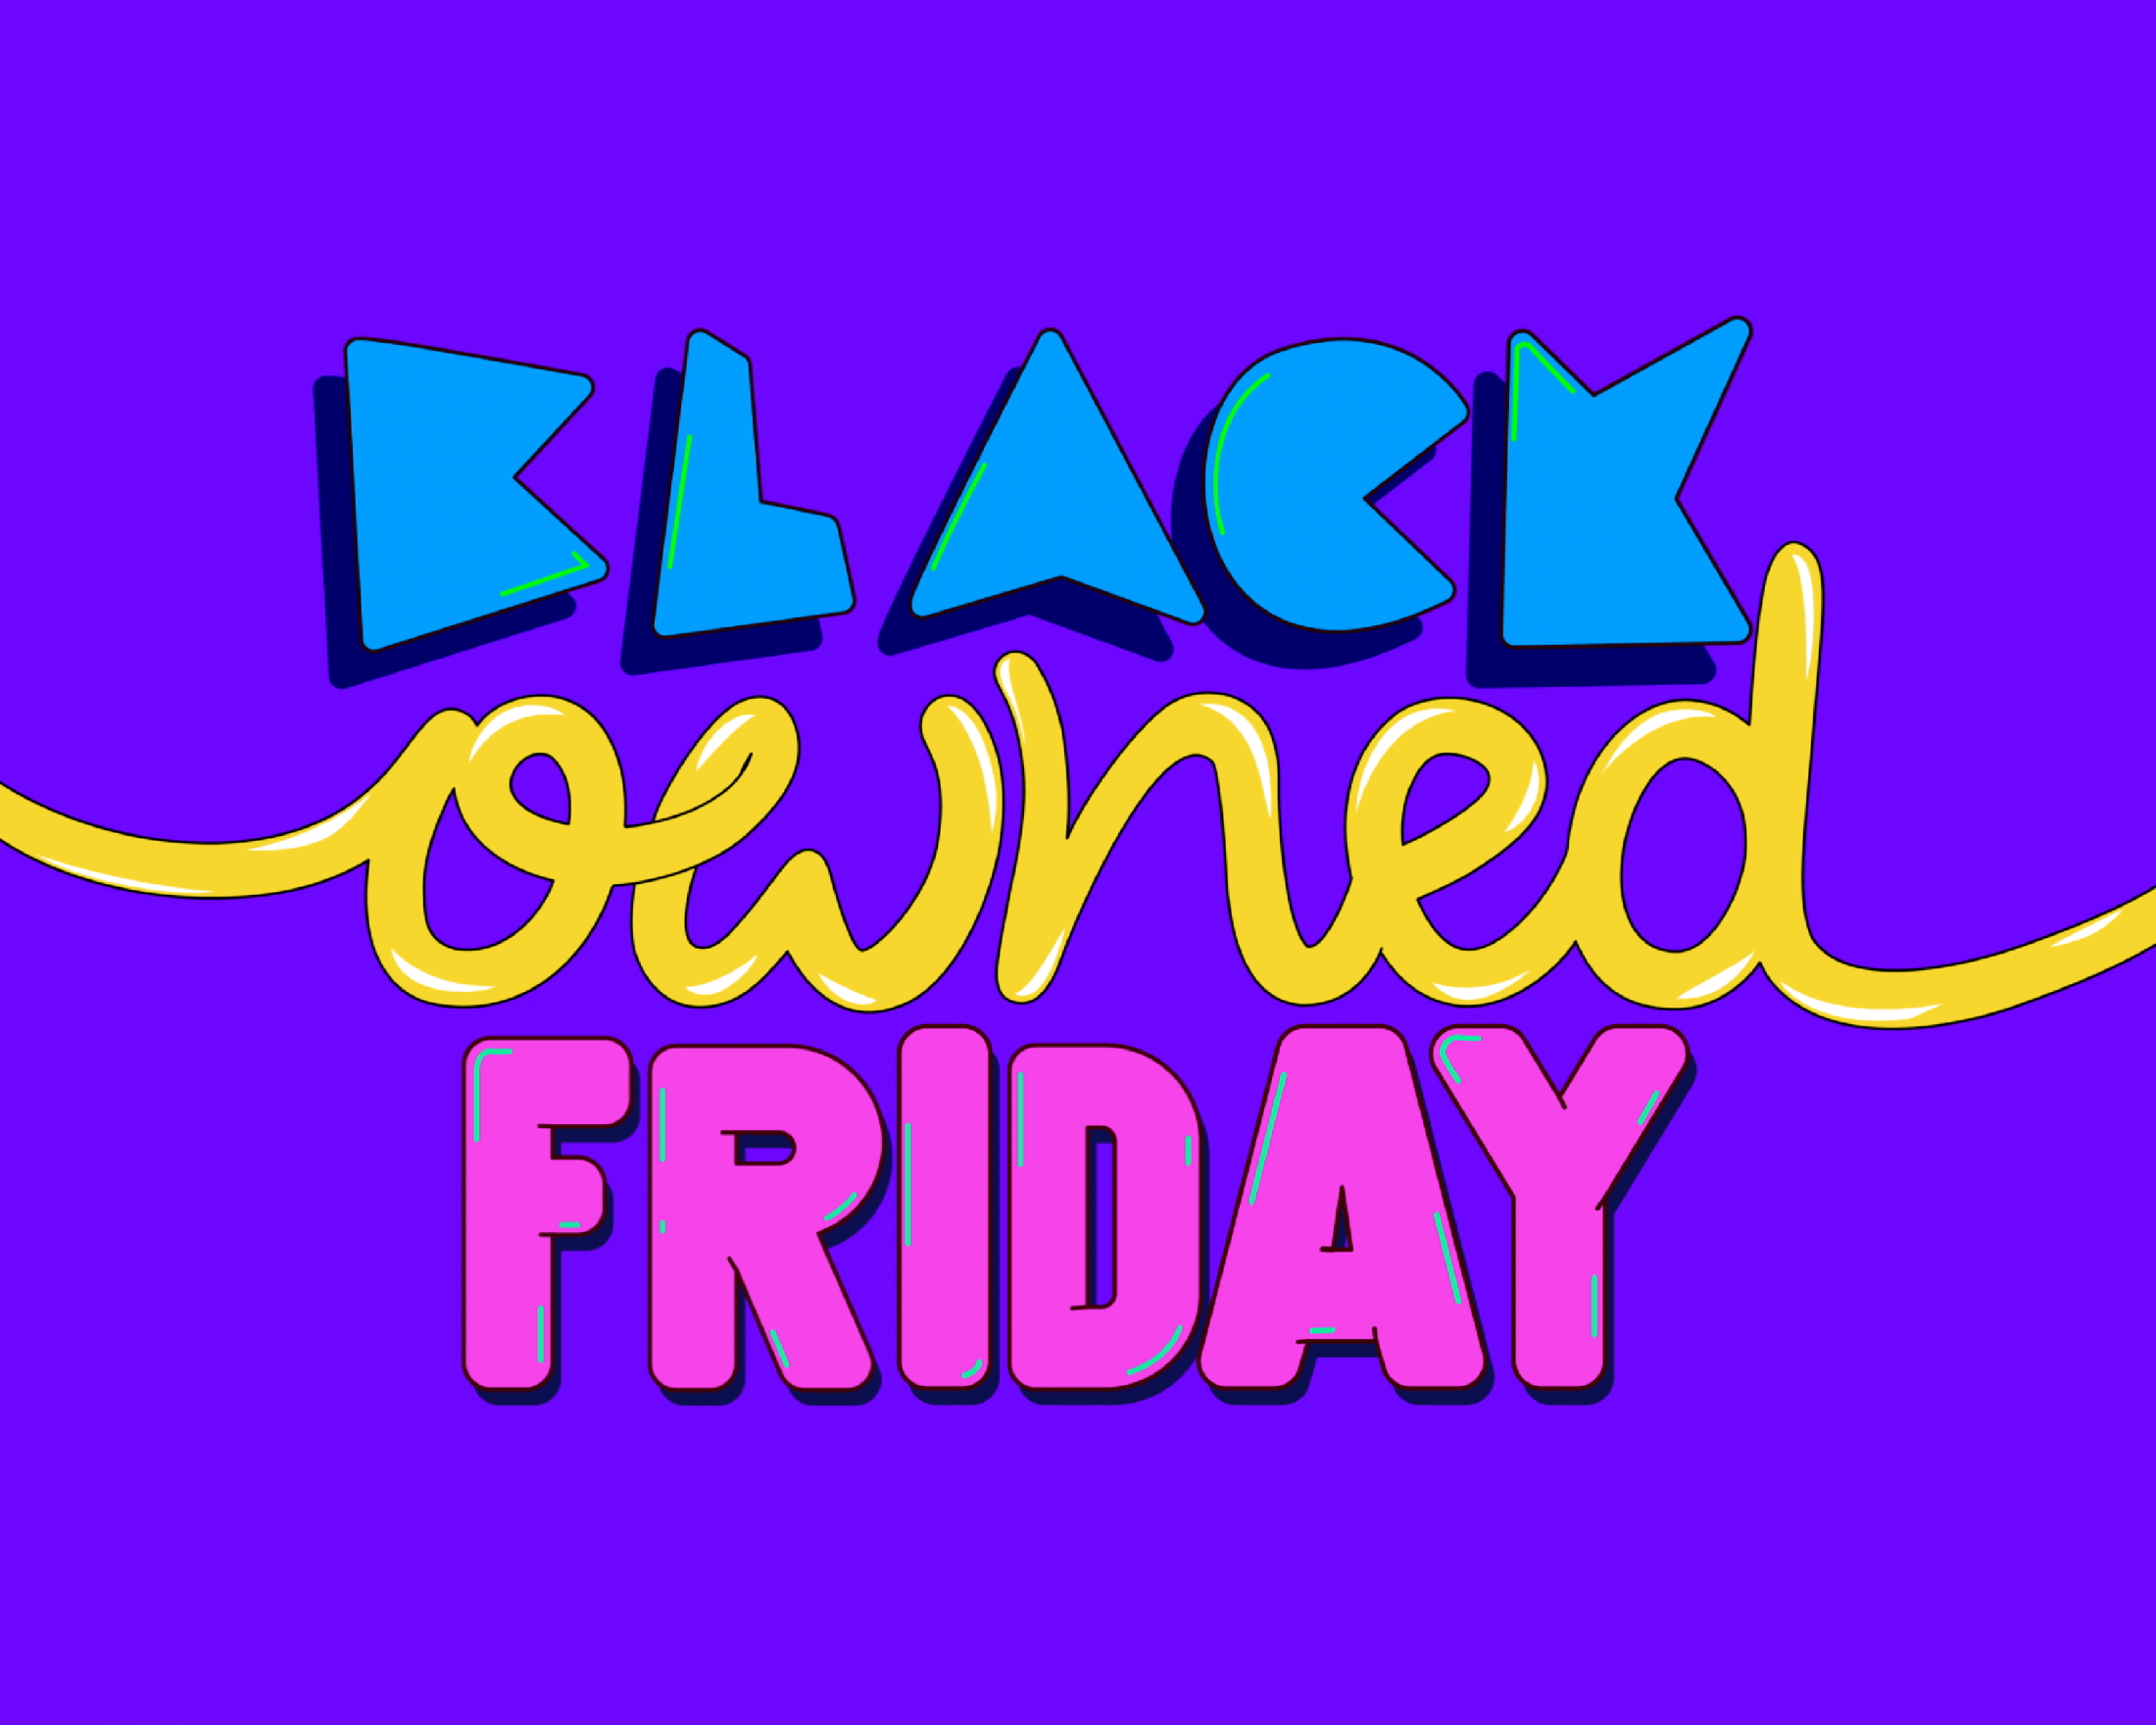 Thumbnail for Google: Black-Owned Friday